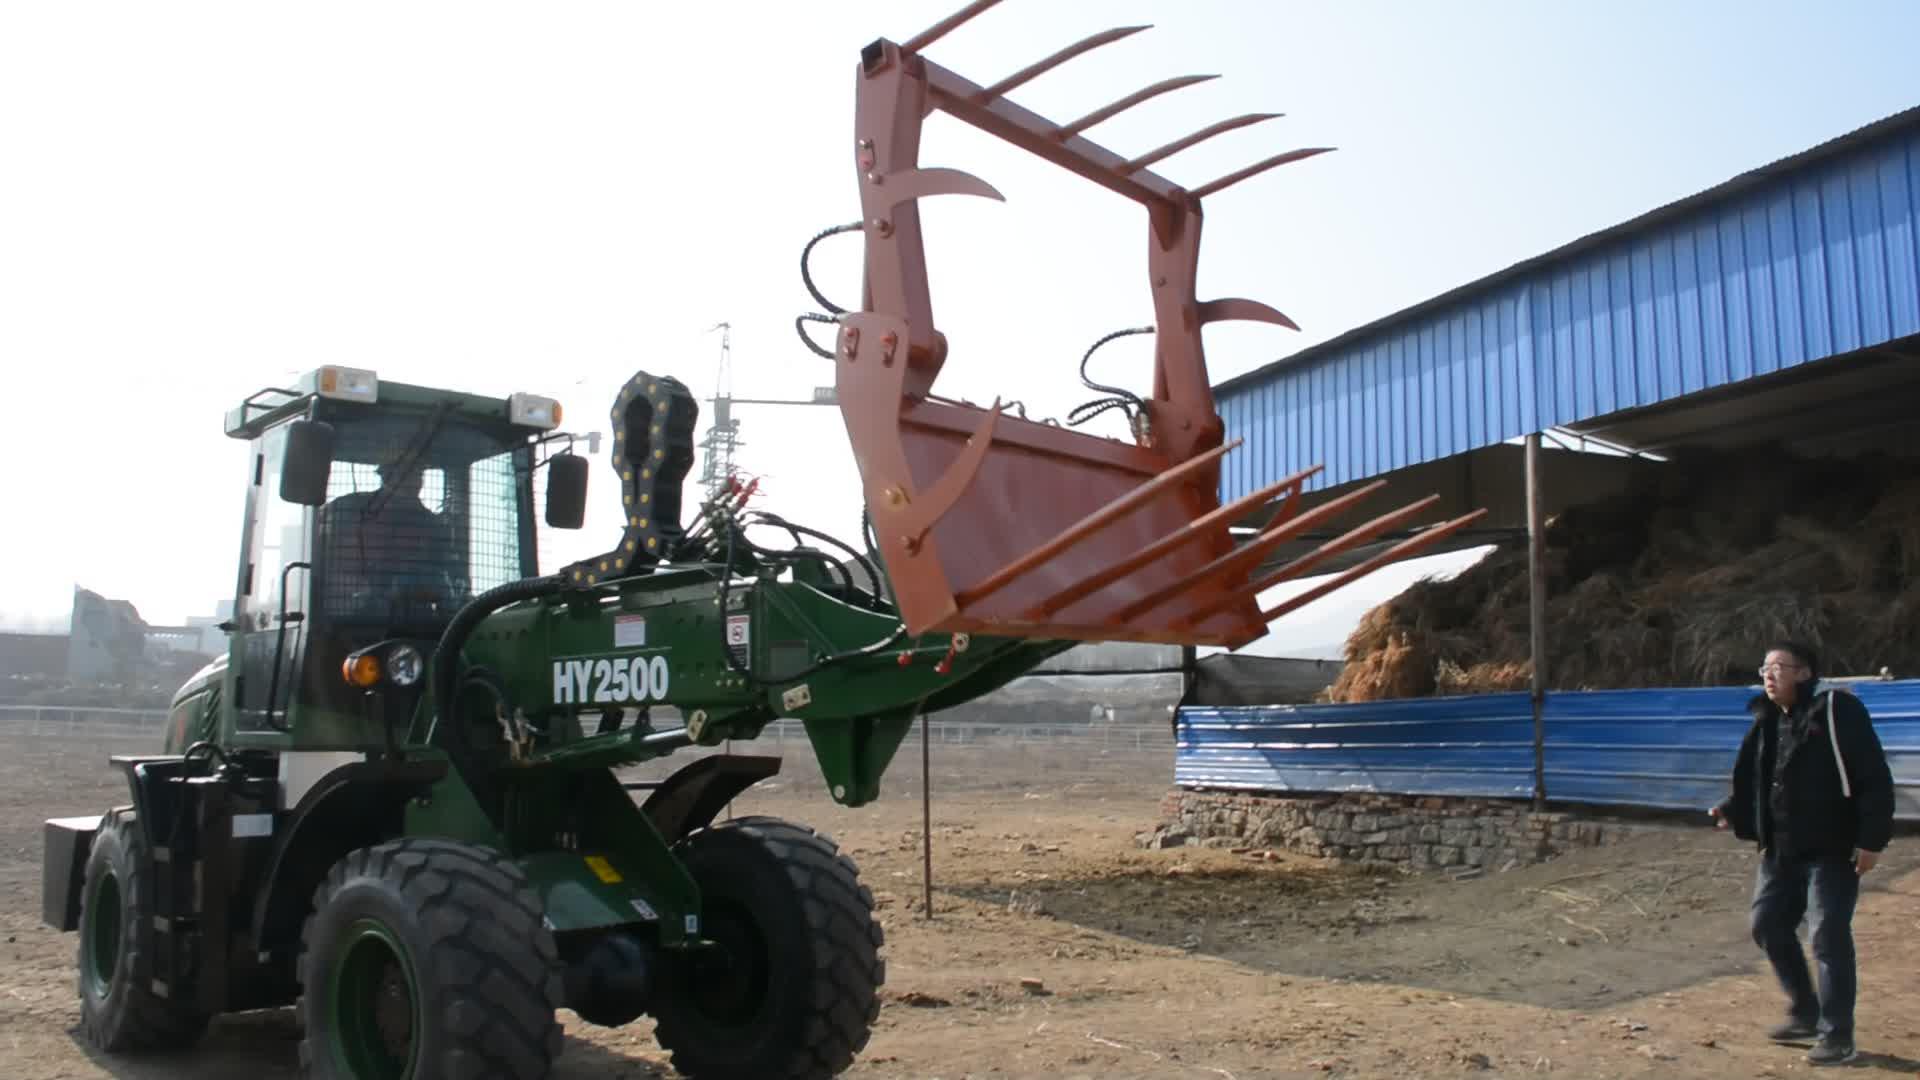 Telescopic Loader TL1500 Tipe Bergerak Traktor Pertanian Cina